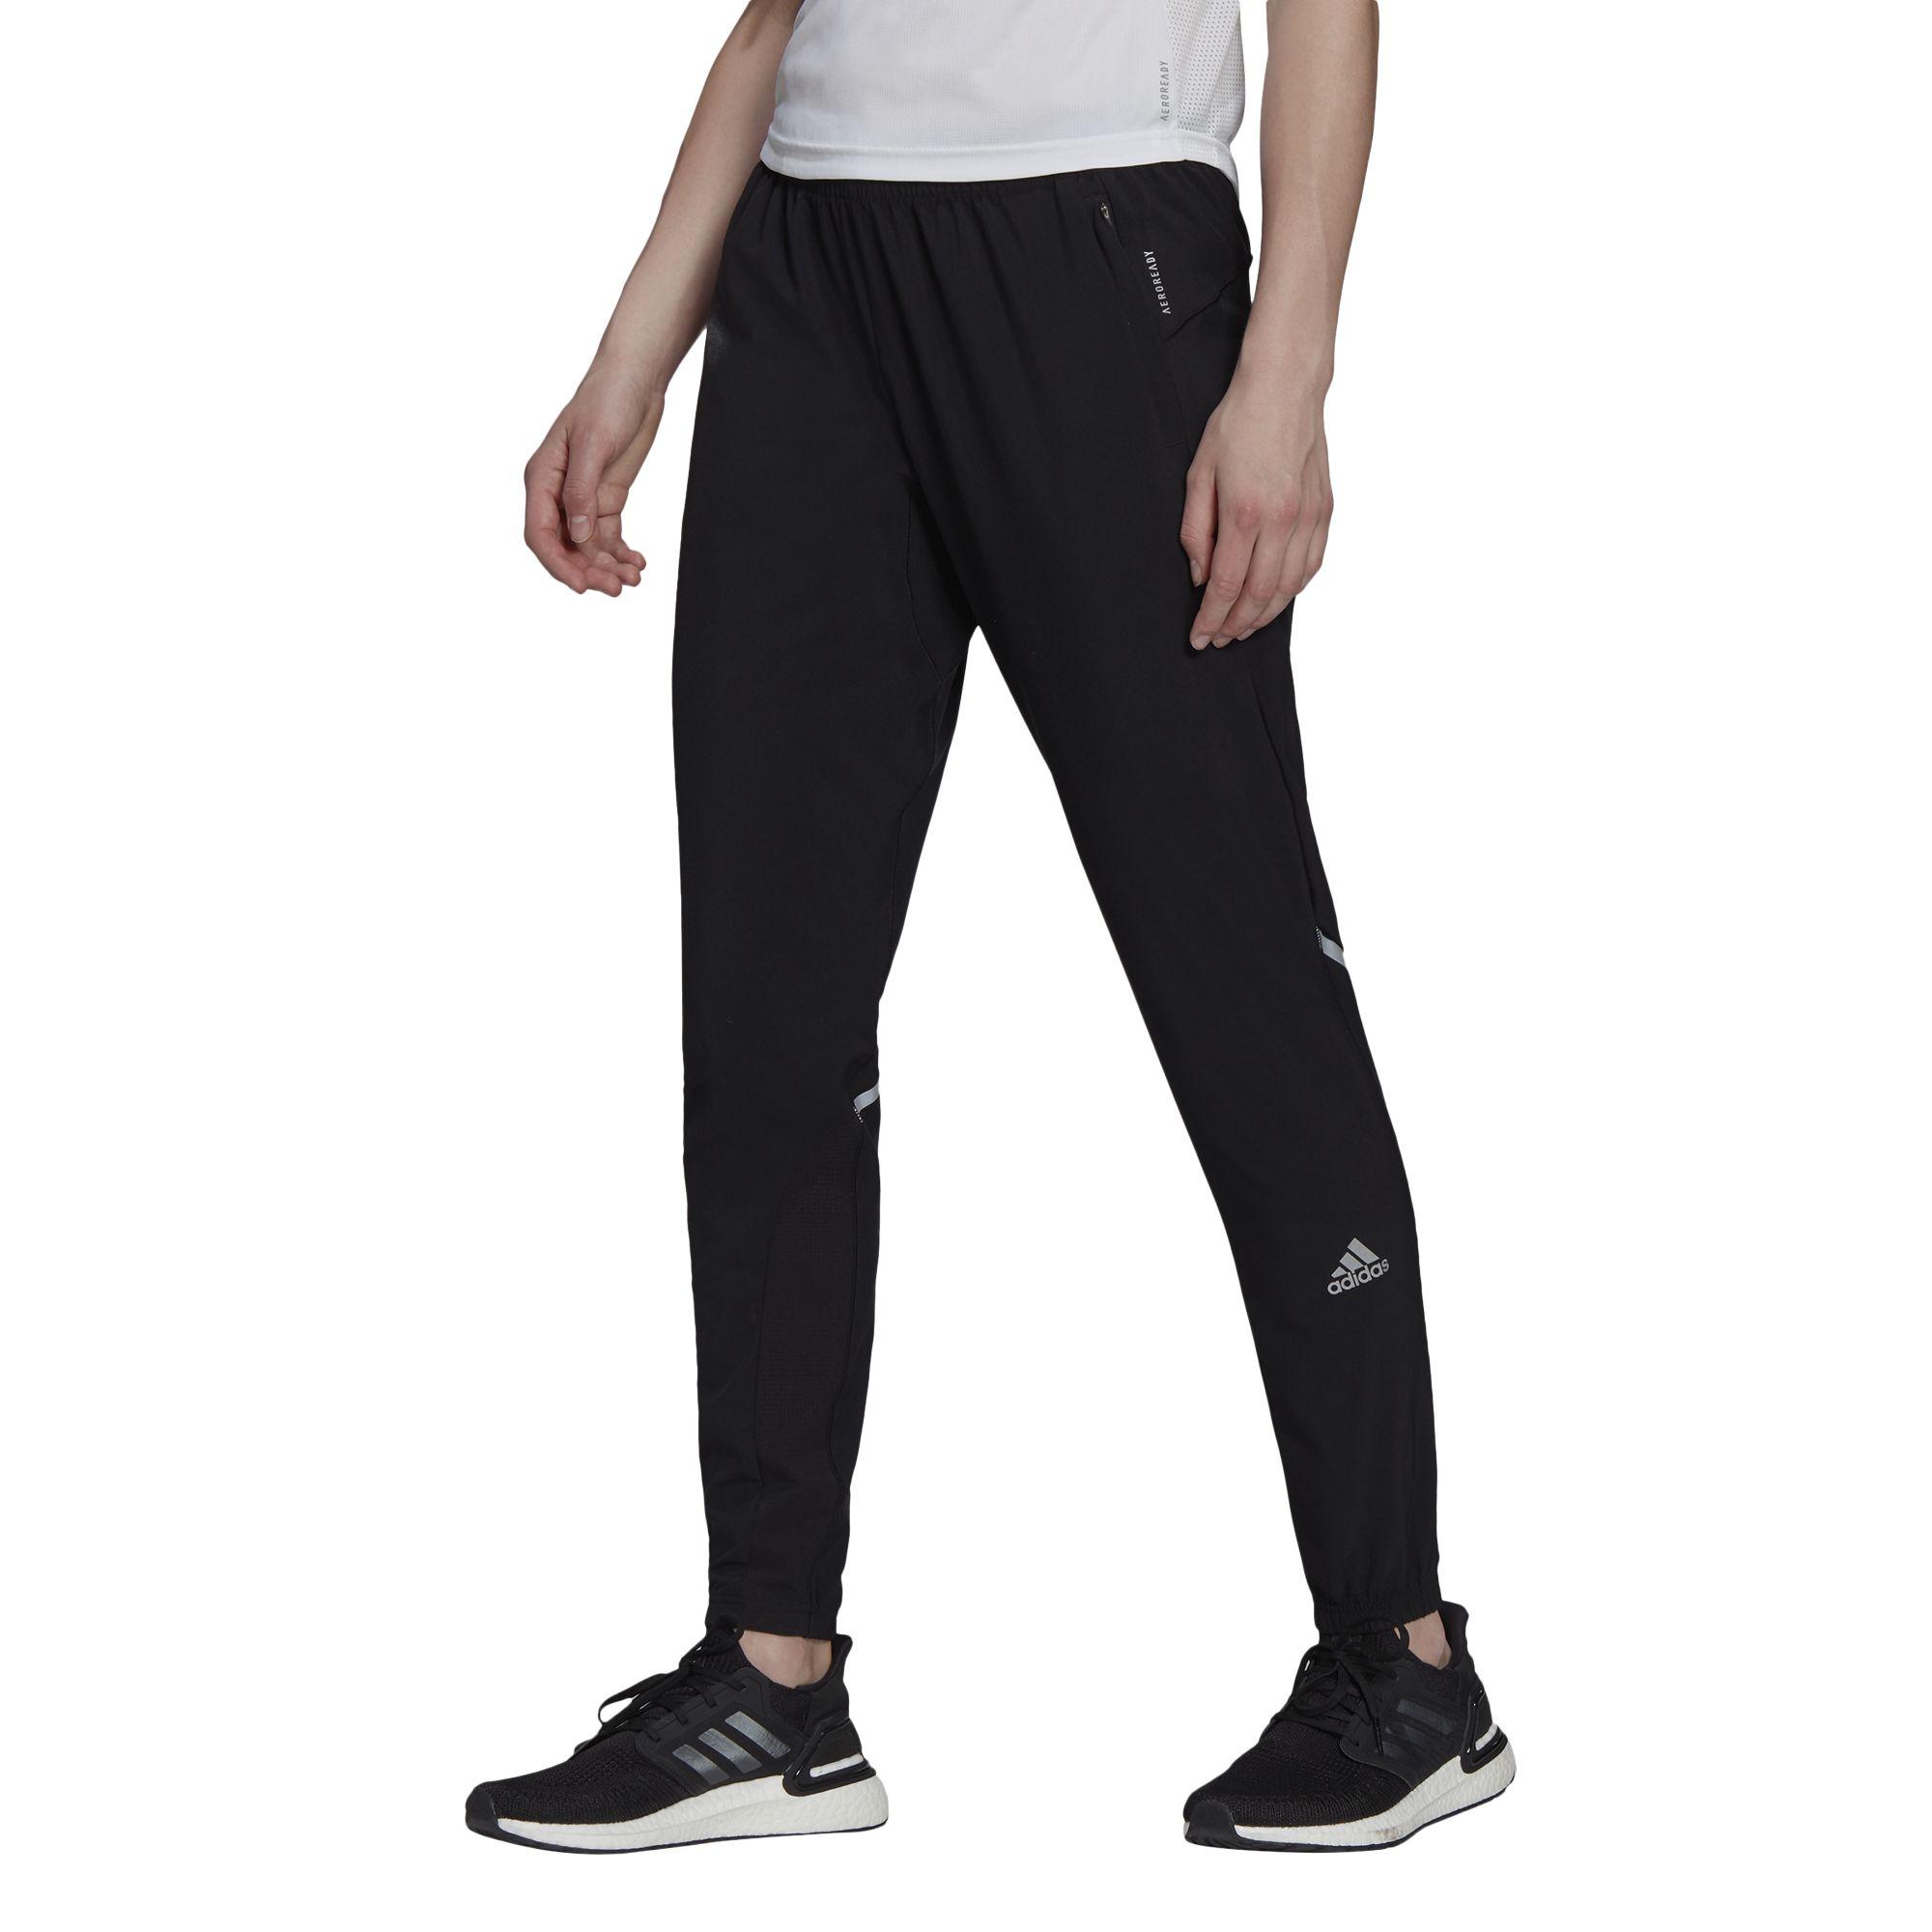 adidas Lady Confident Pant (Black)